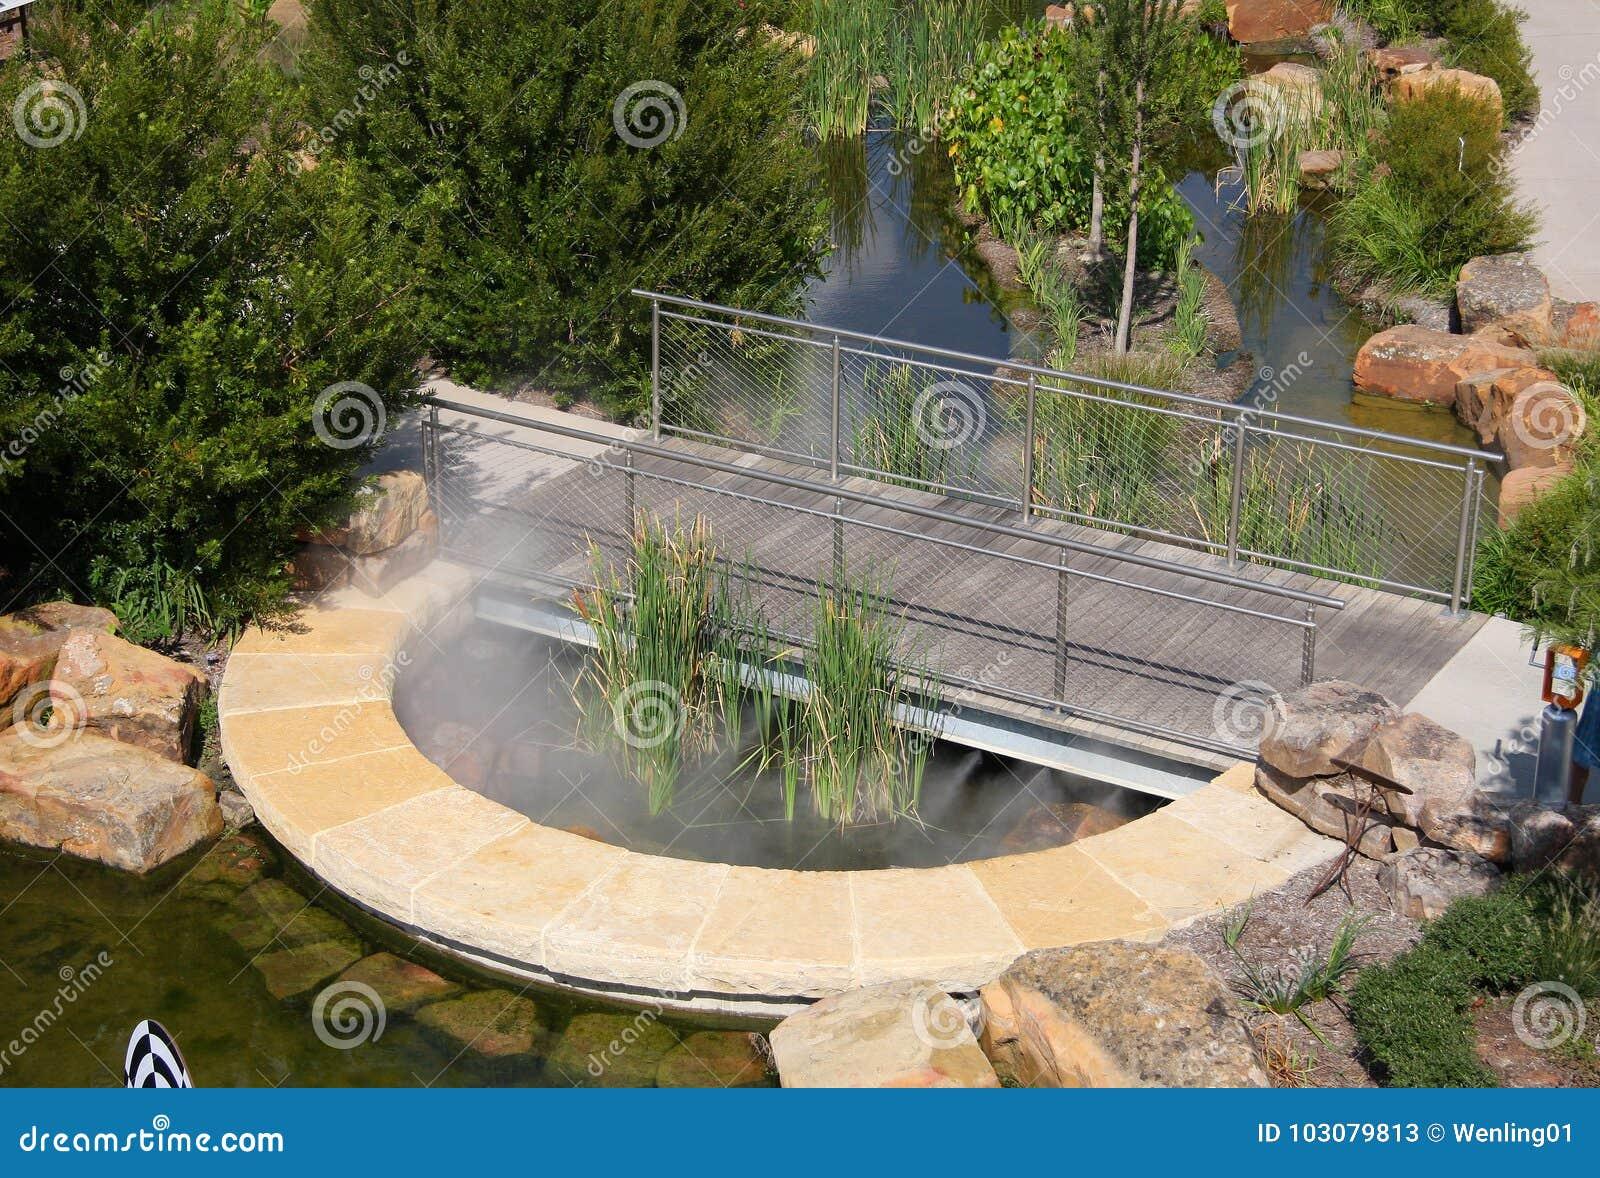 Children Adventure Garden At Dallas Arboretum Stock Image Image Of Natural Landscapes 103079813